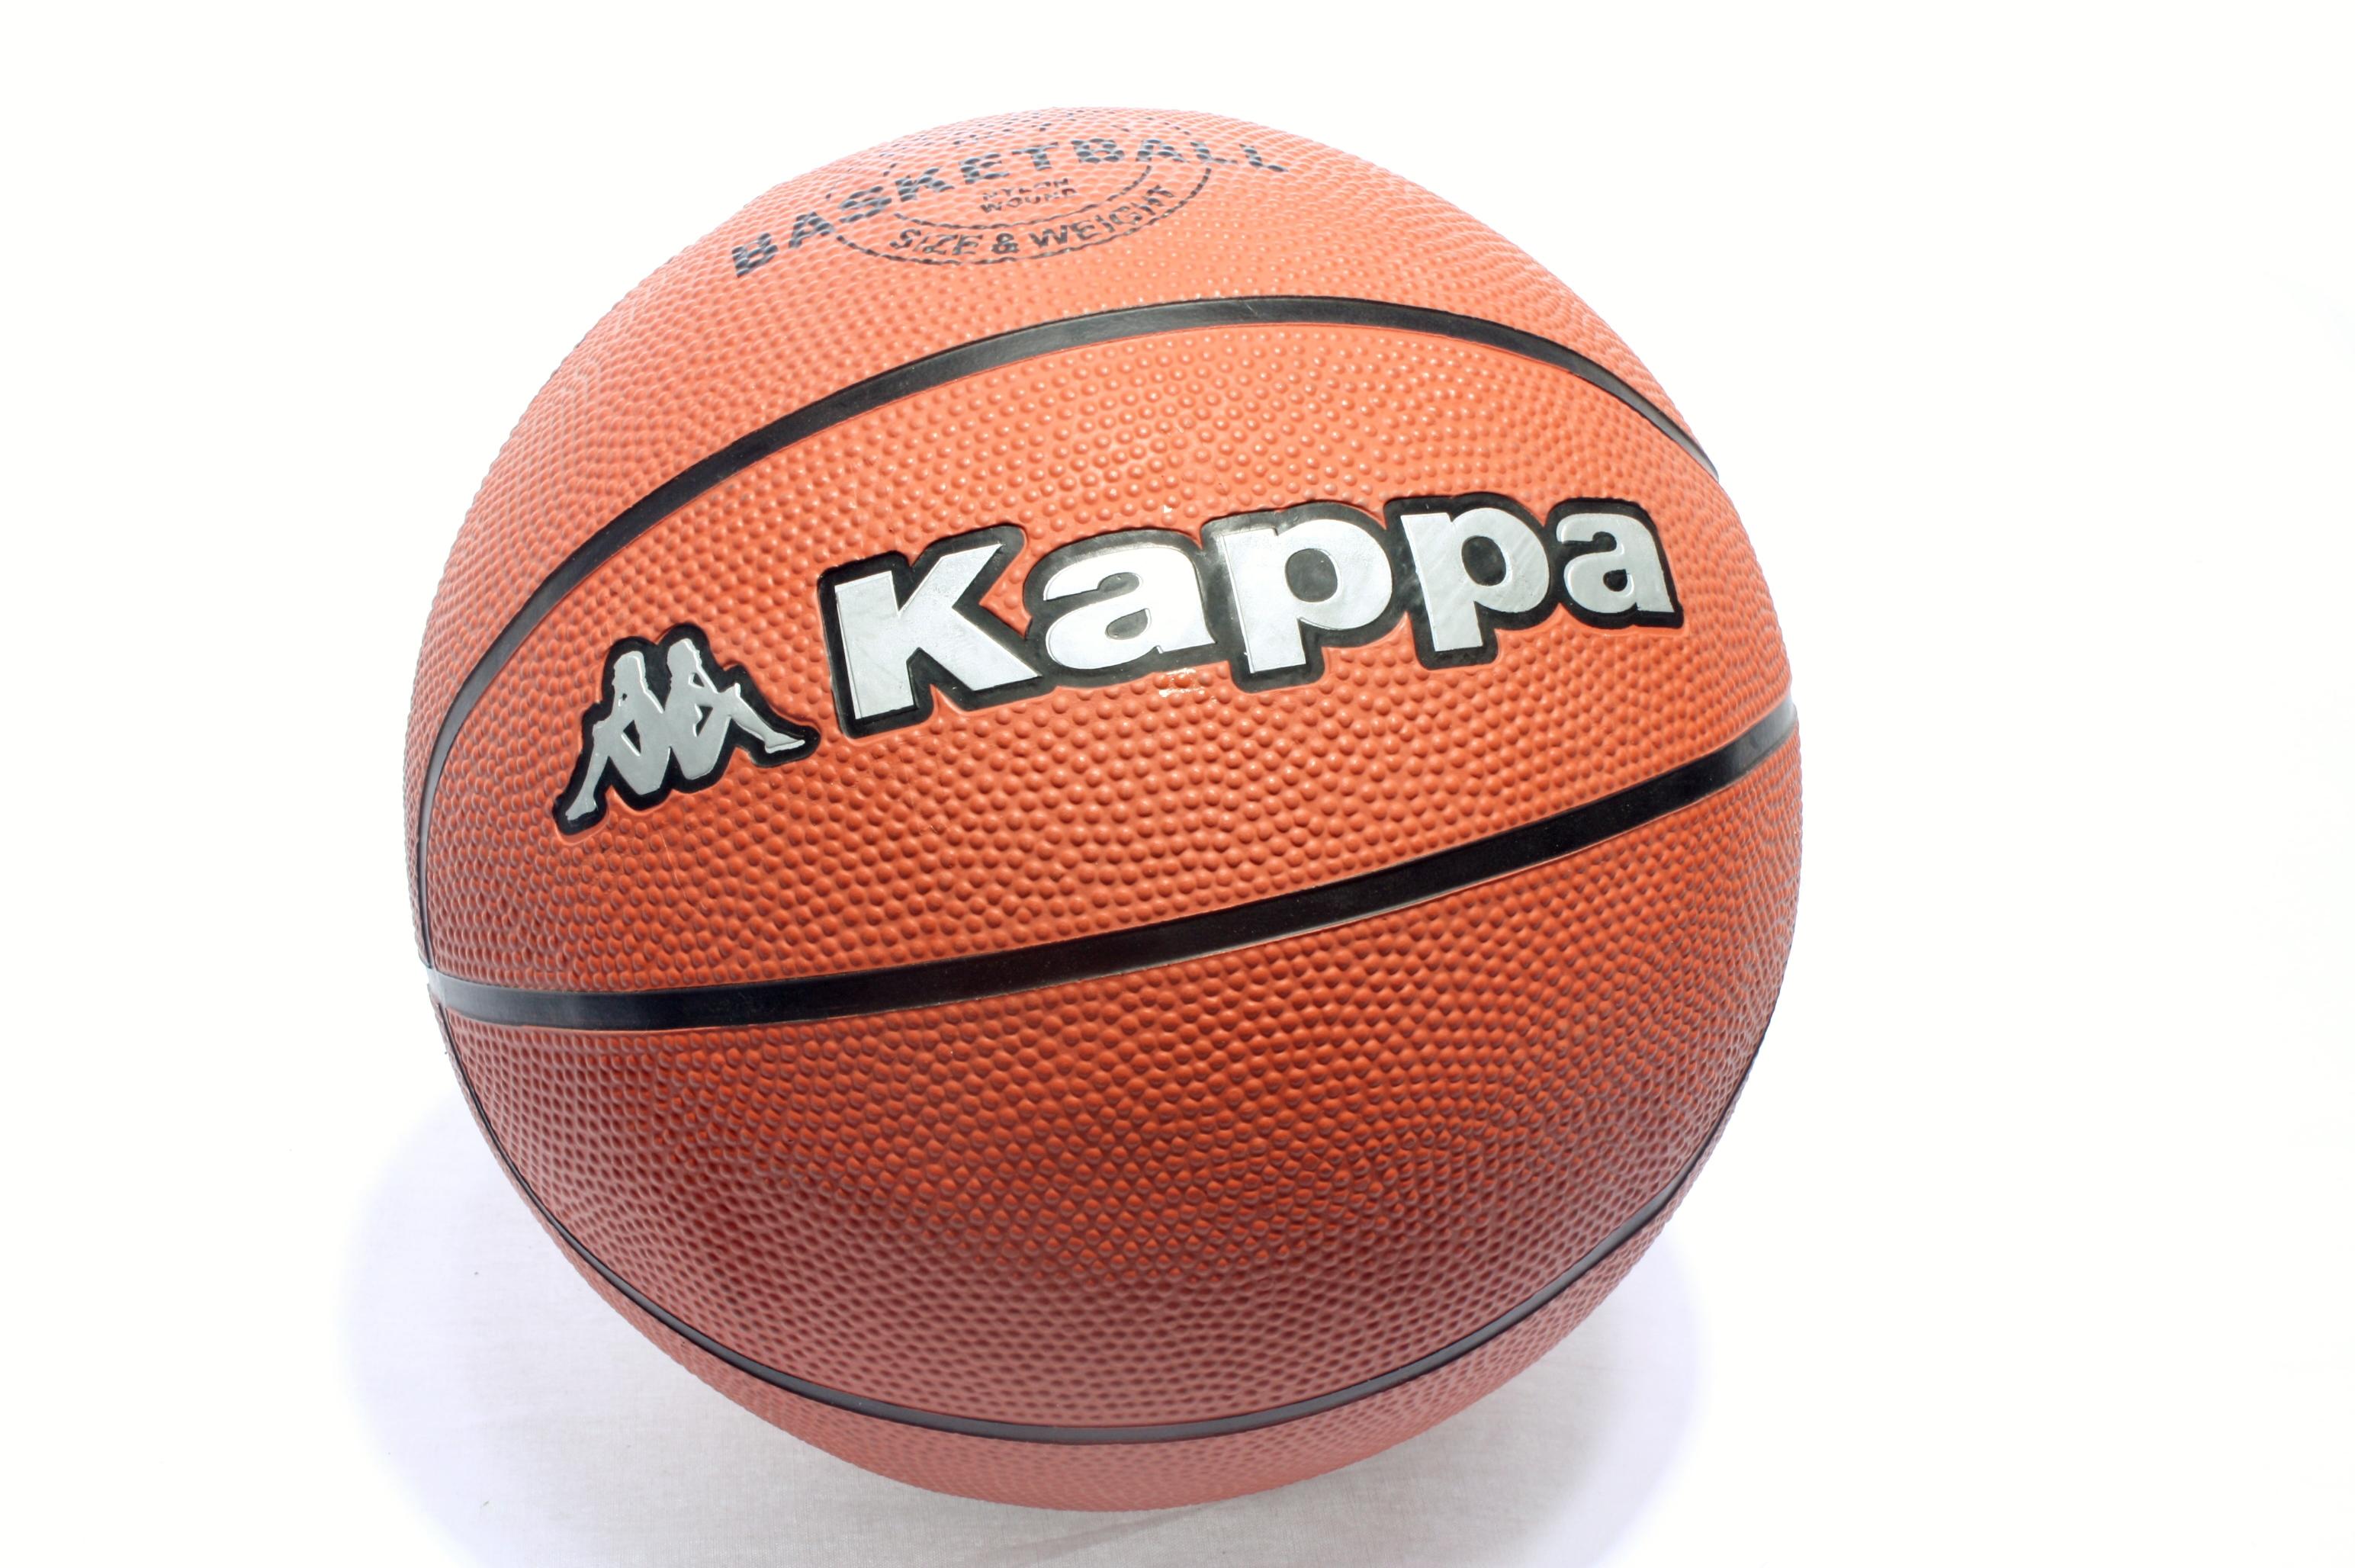 kappa basketball gr 7 ballpumpe spielball nba ball pumpe bbl trainingsball ebay. Black Bedroom Furniture Sets. Home Design Ideas